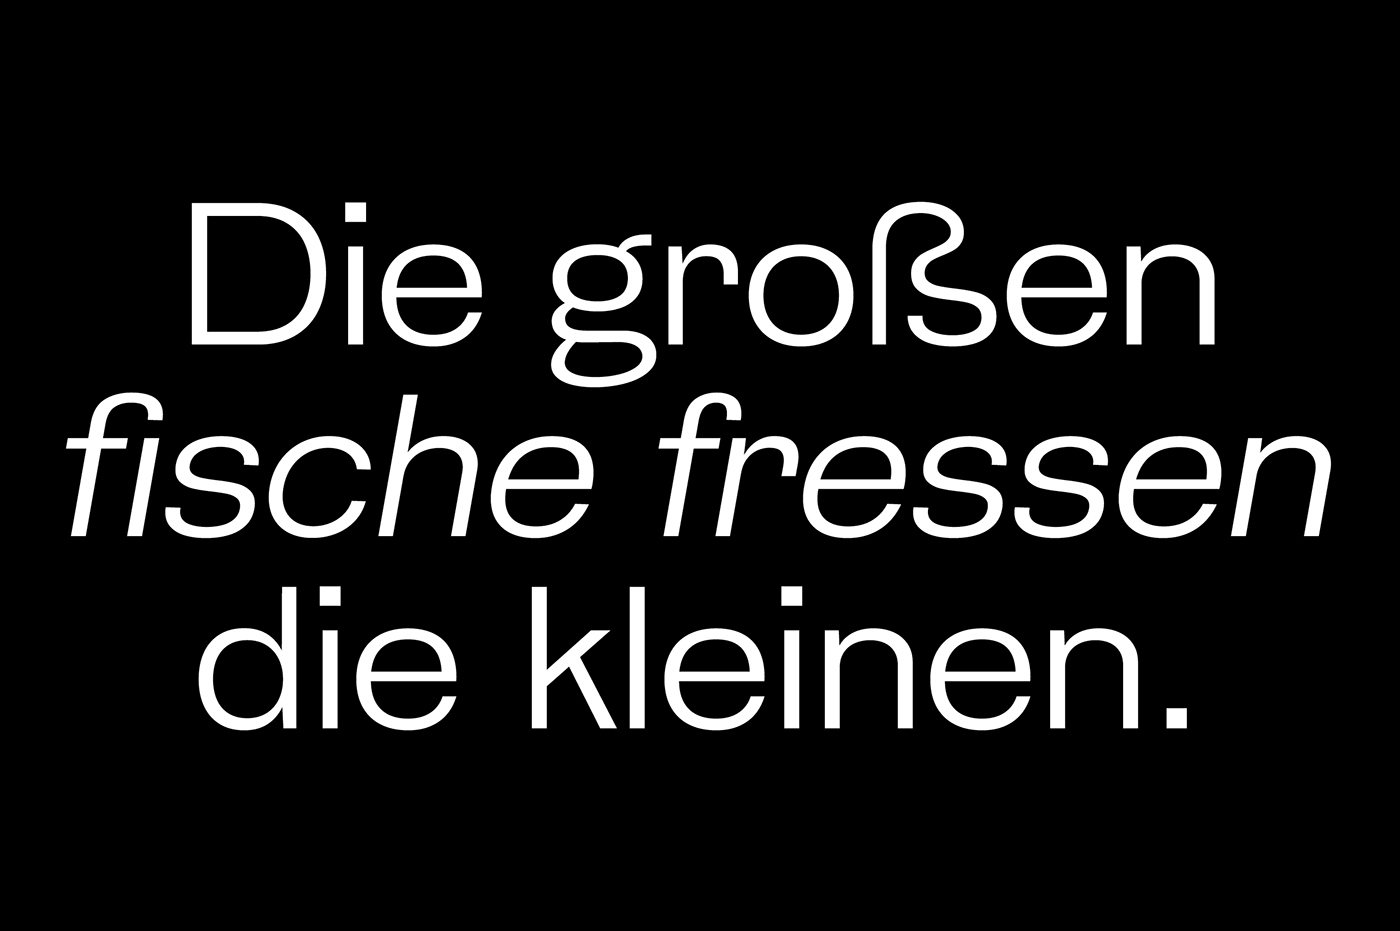 gothic sans serif old industrial Workhorse free libre gratis